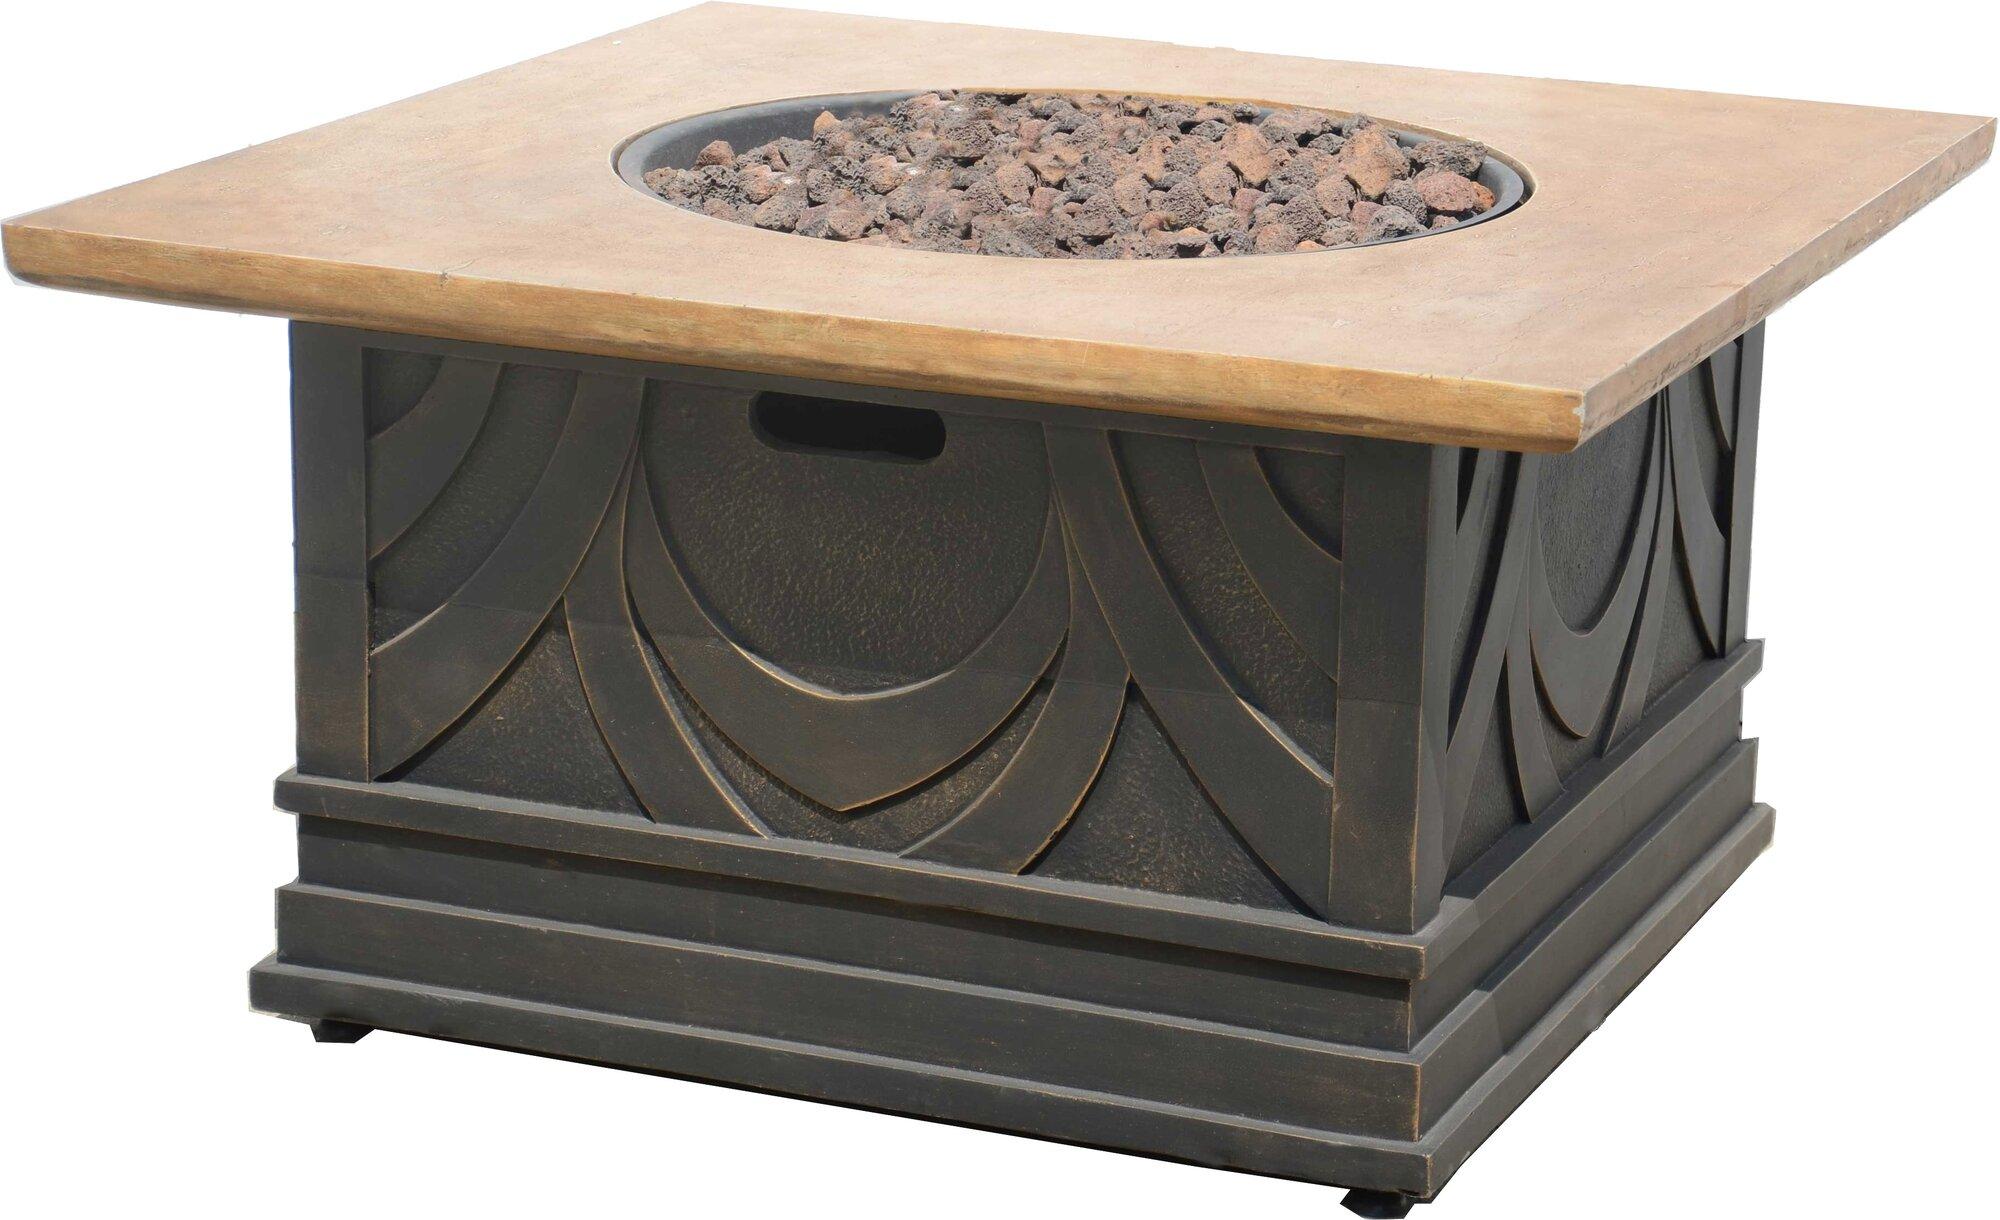 Costco Fire Pit Table Bond Manufacturing Avila Envirostone Propane Fire Pit Table | eBay